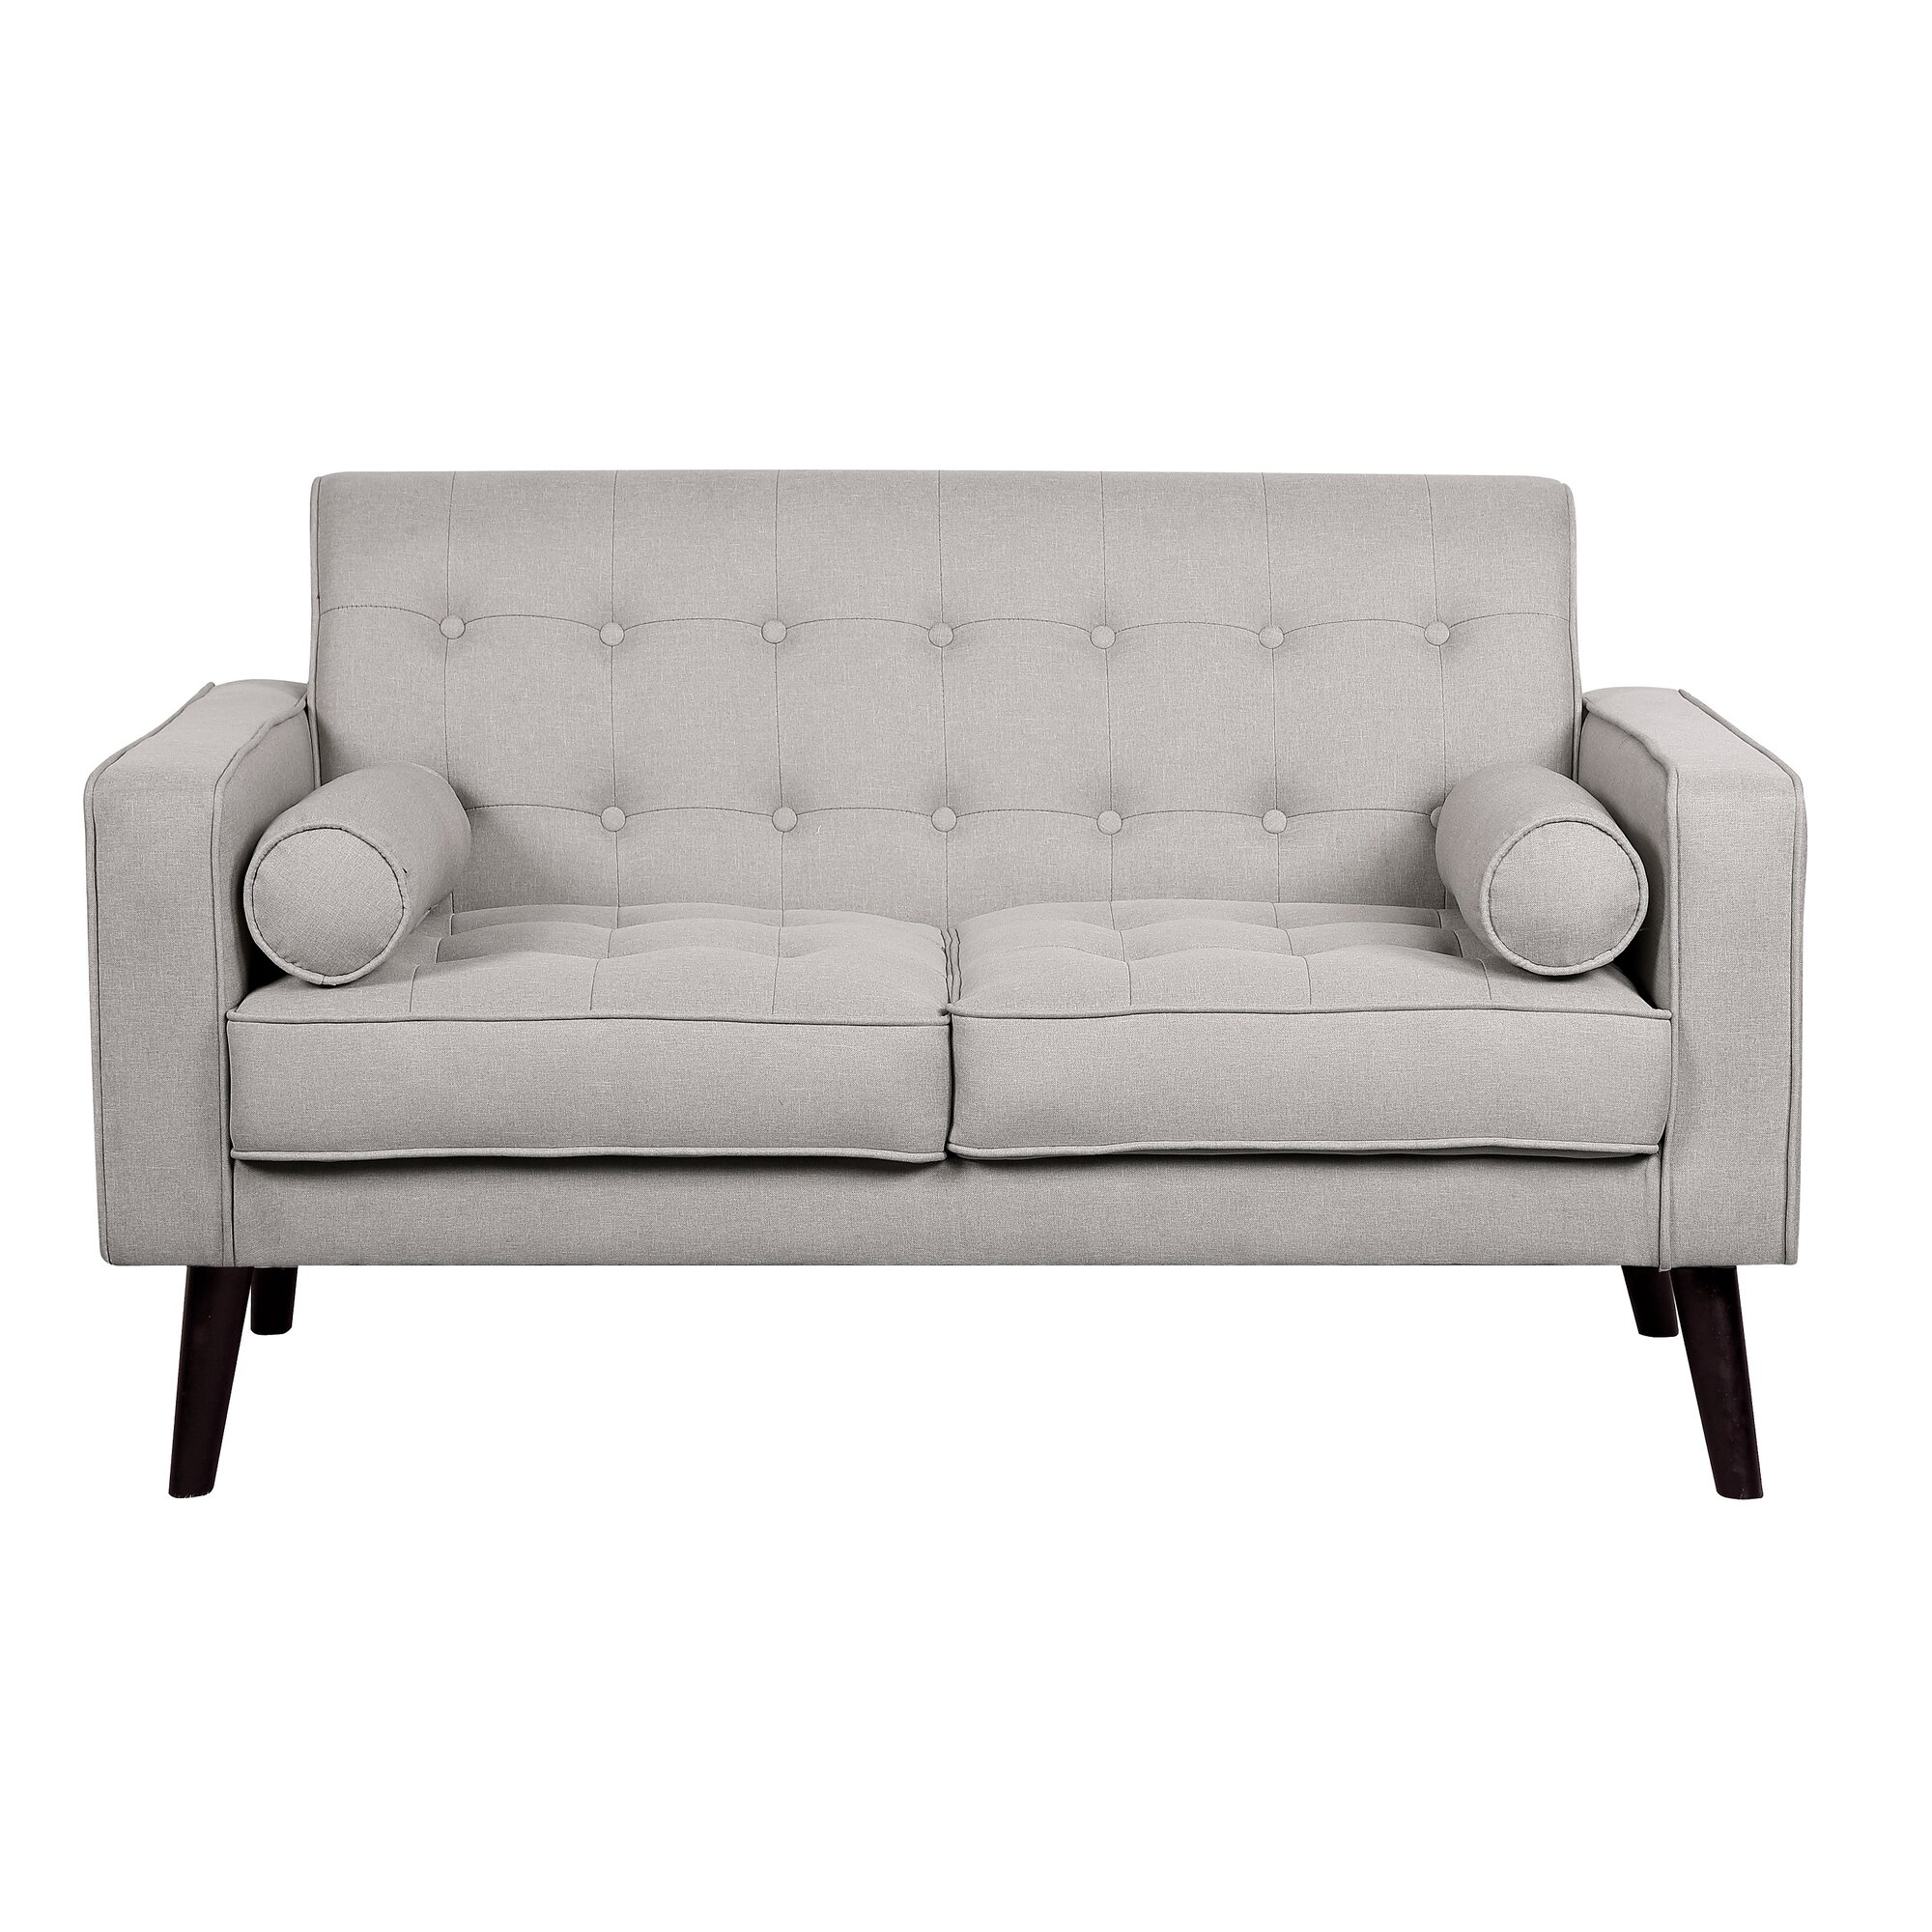 Overstuffed Sofa And Loveseat Latest Overstuffed Sofa And